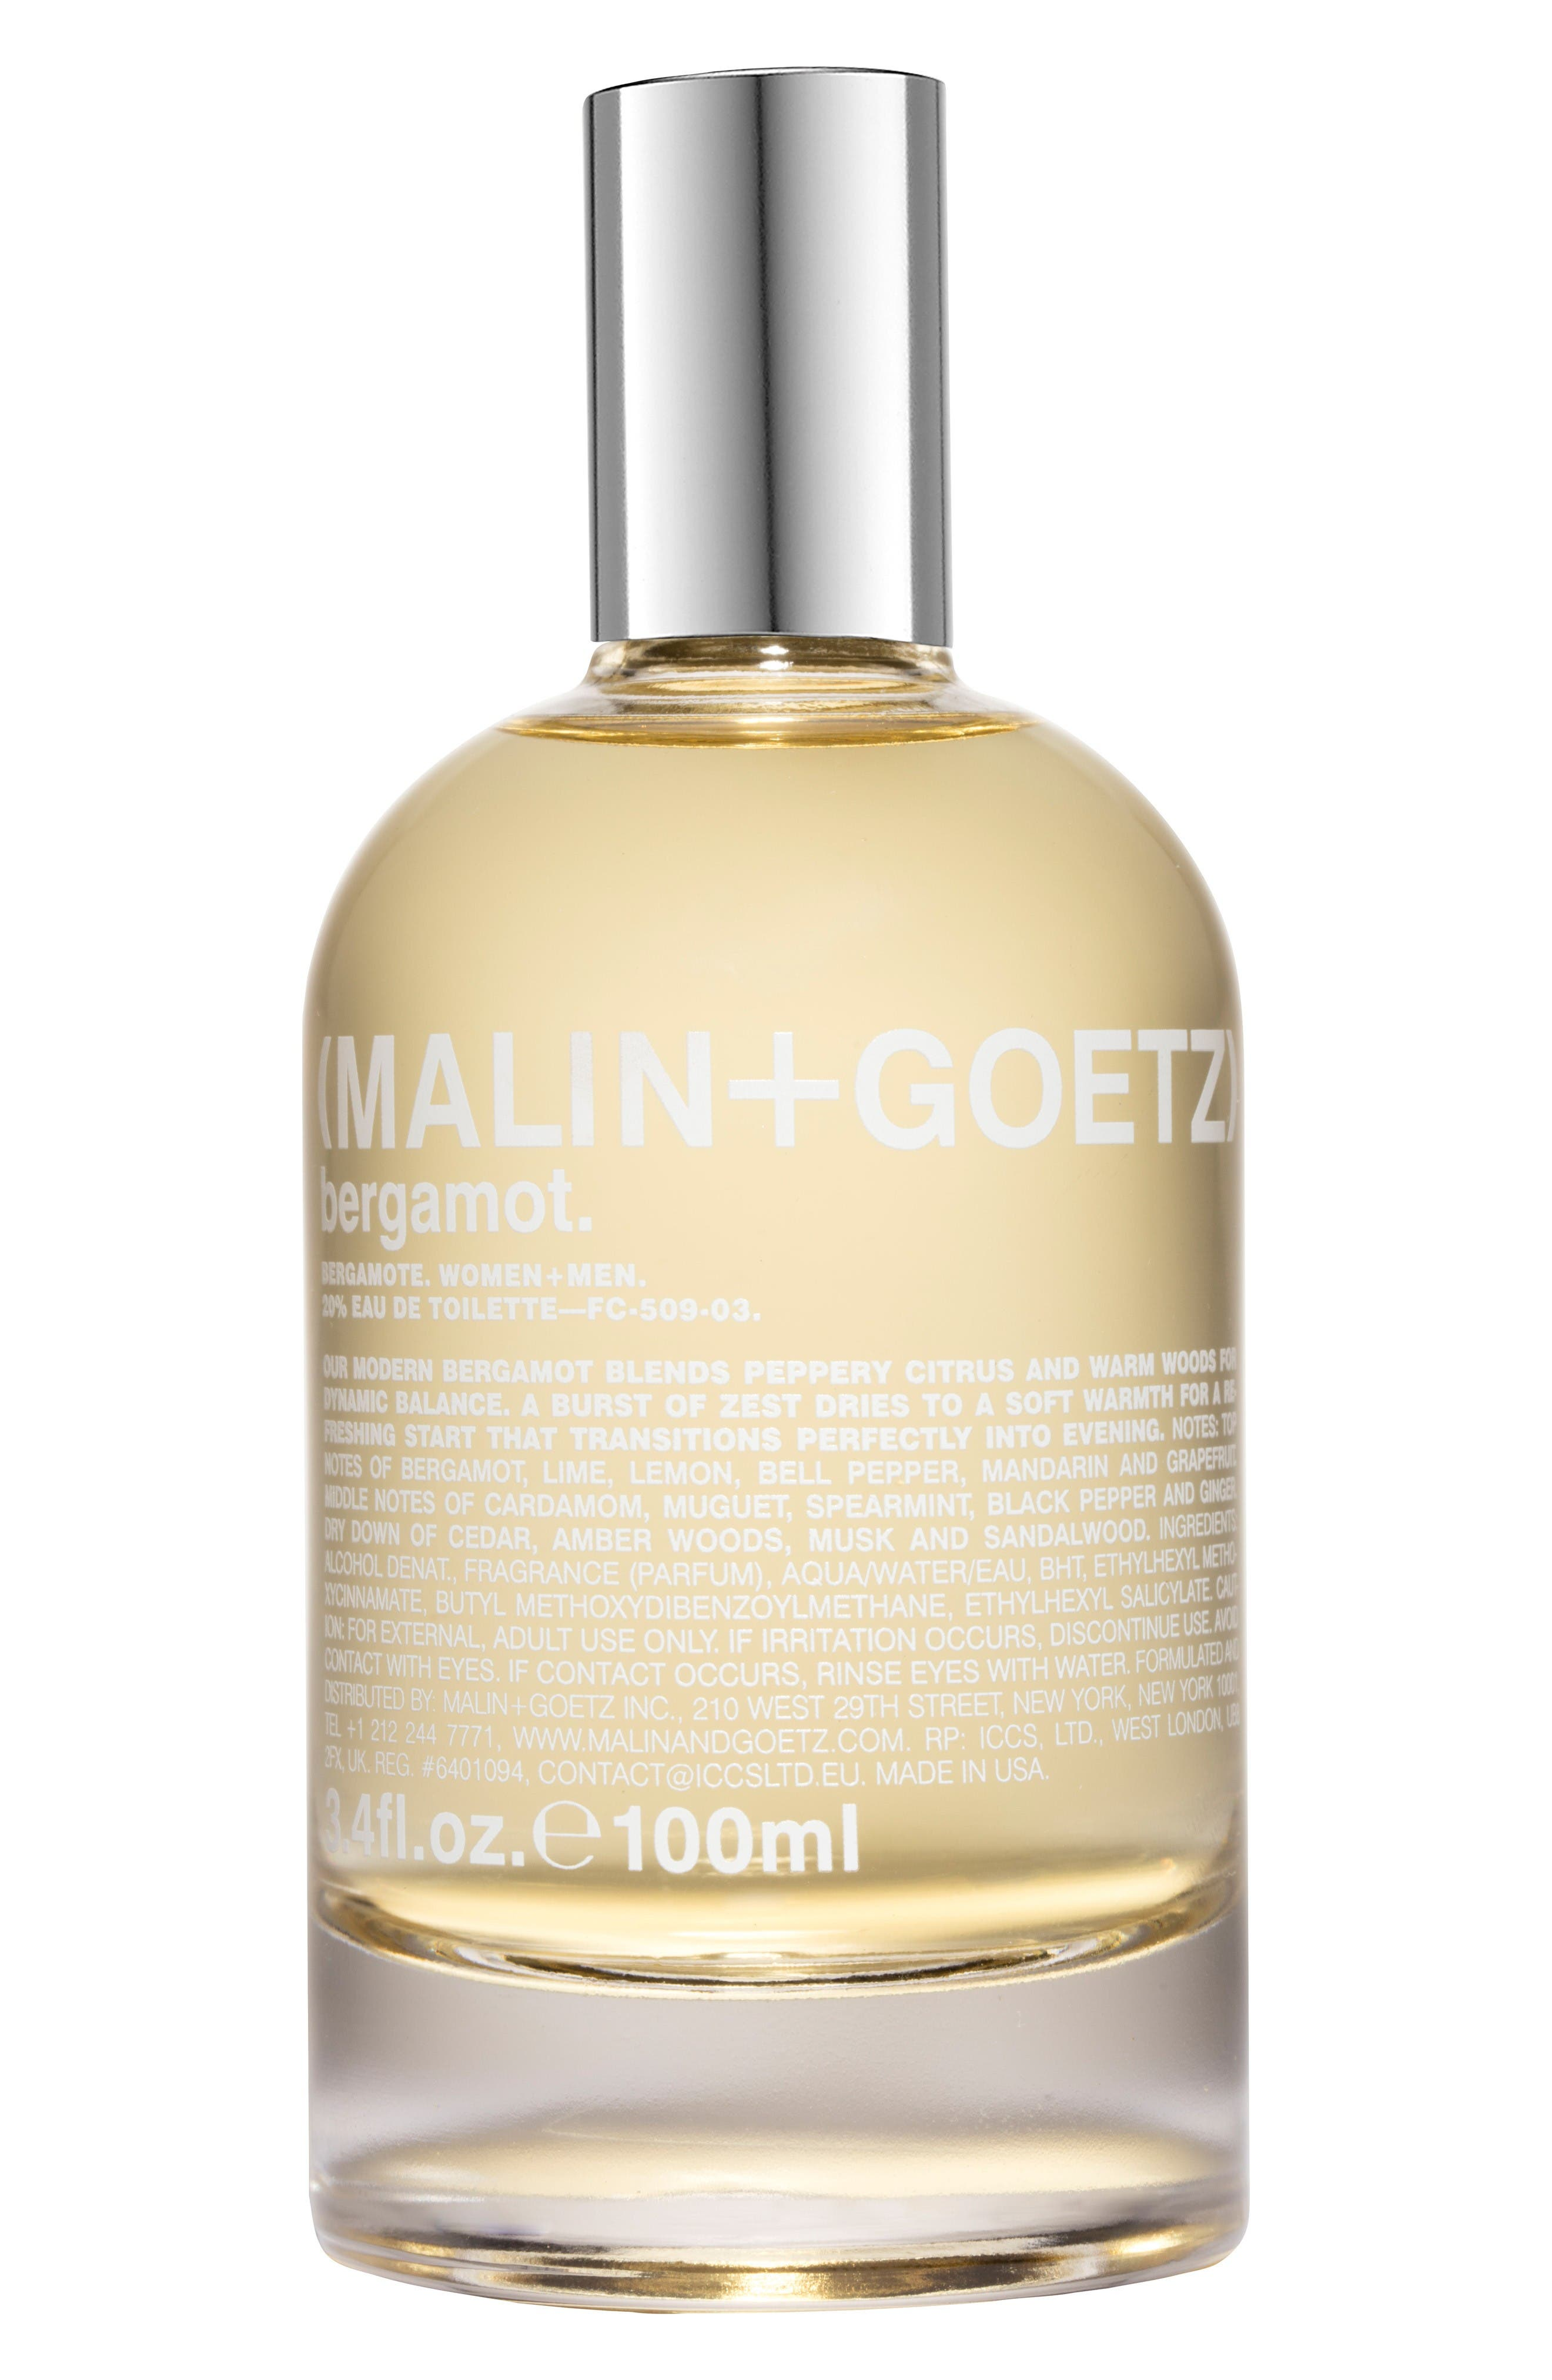 Alternate Image 1 Selected - Malin + Goetz Bergamot Eau de Toilette